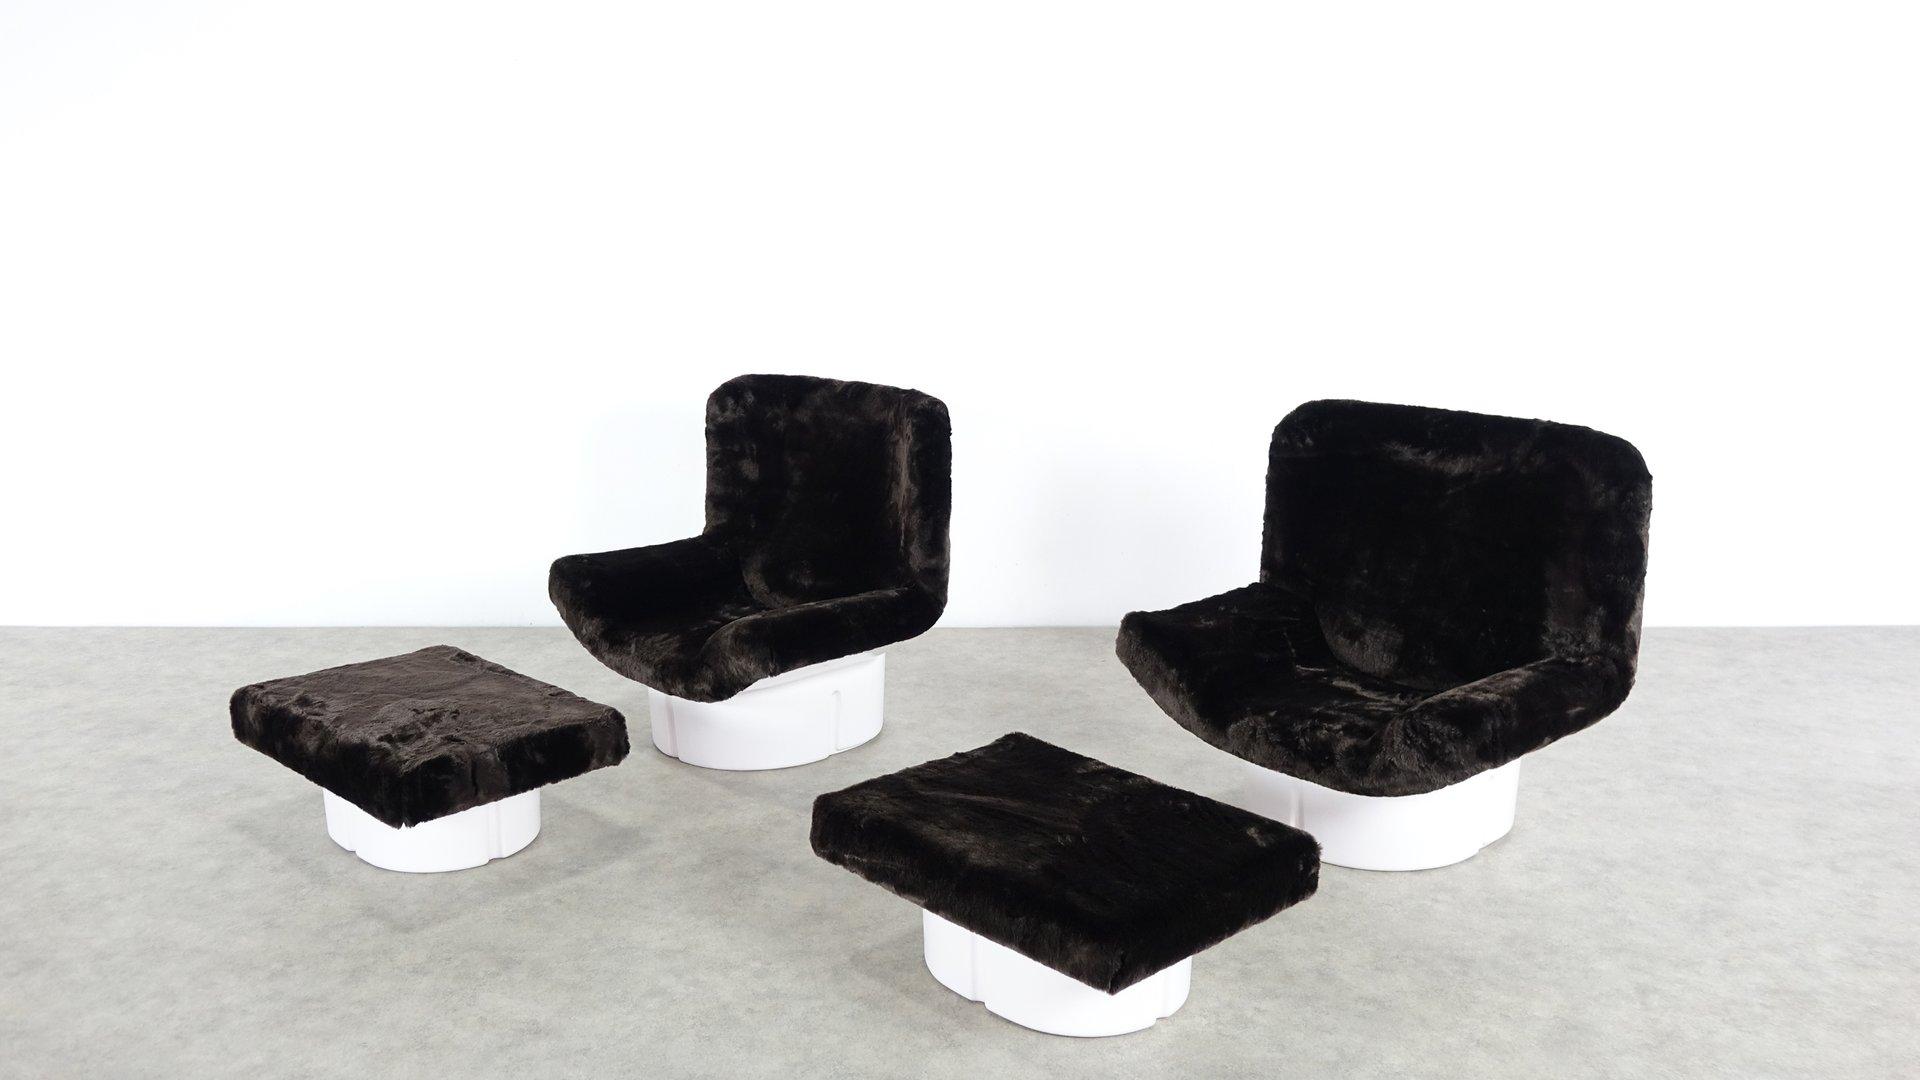 Modell IL Patrone Sessel & Fußhocker von T. Ammannati & G.P. Vitelli f...